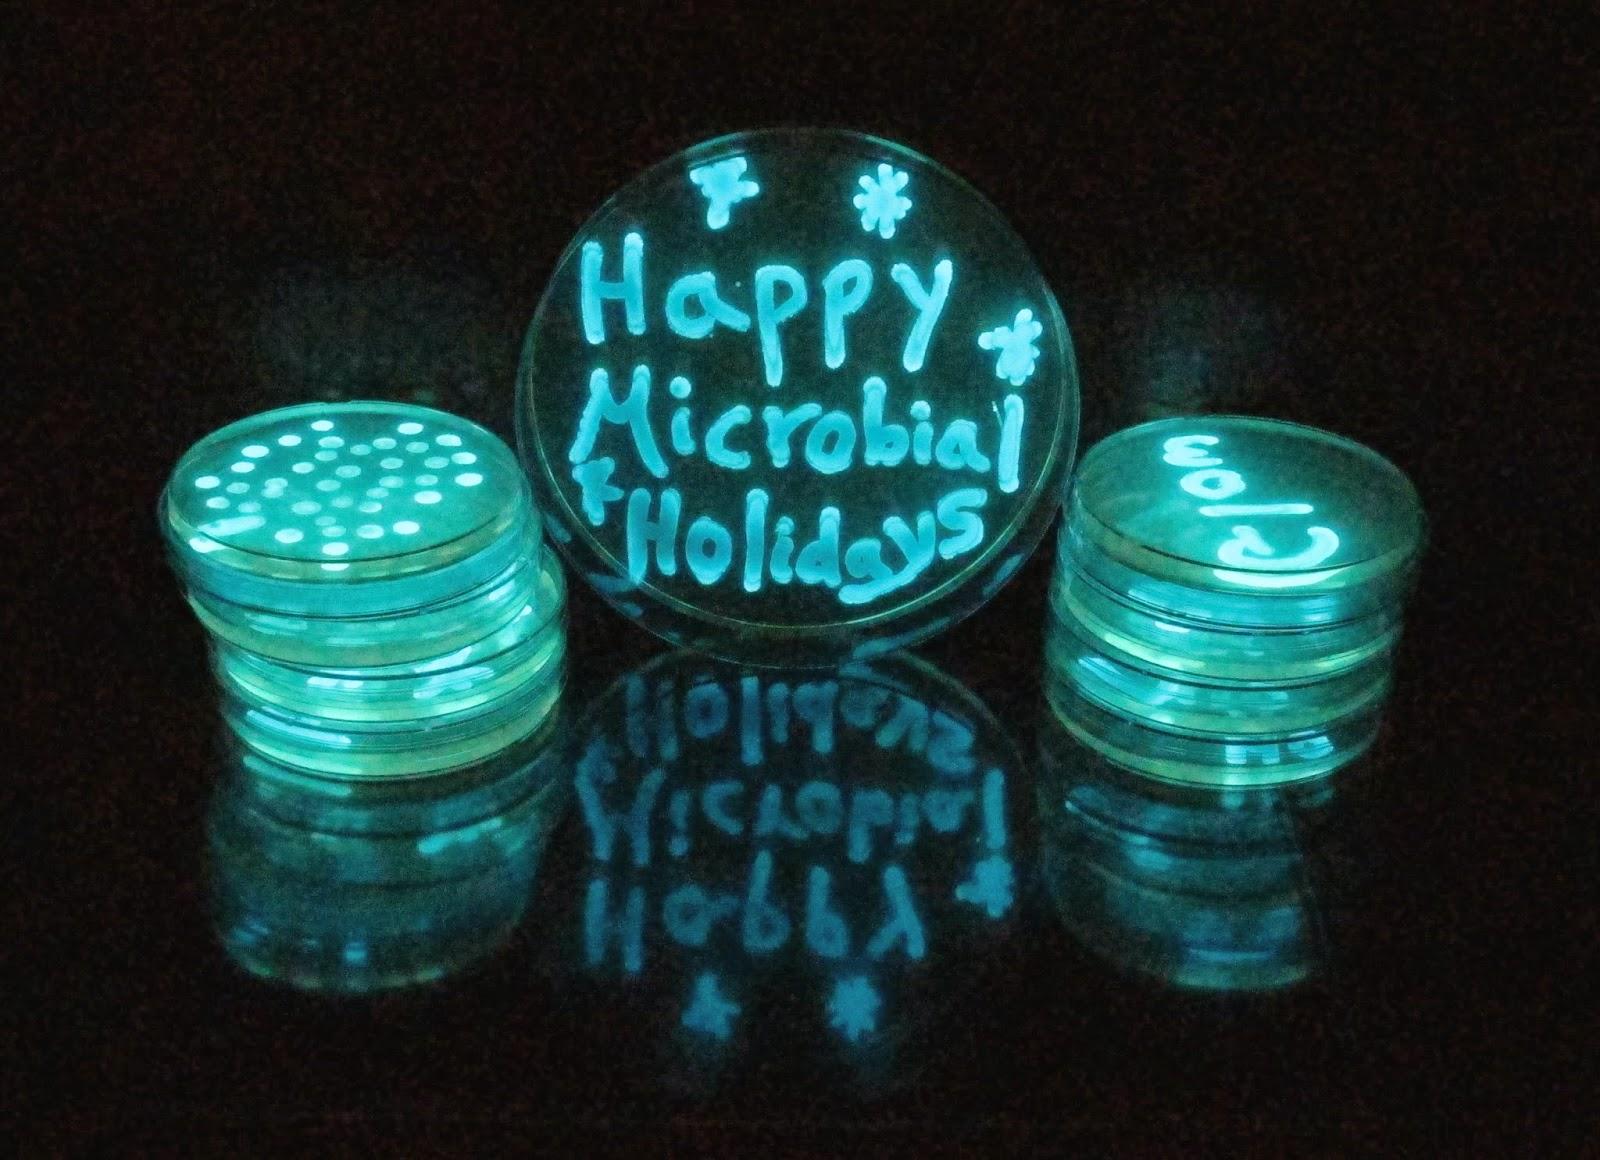 Microbiology fun